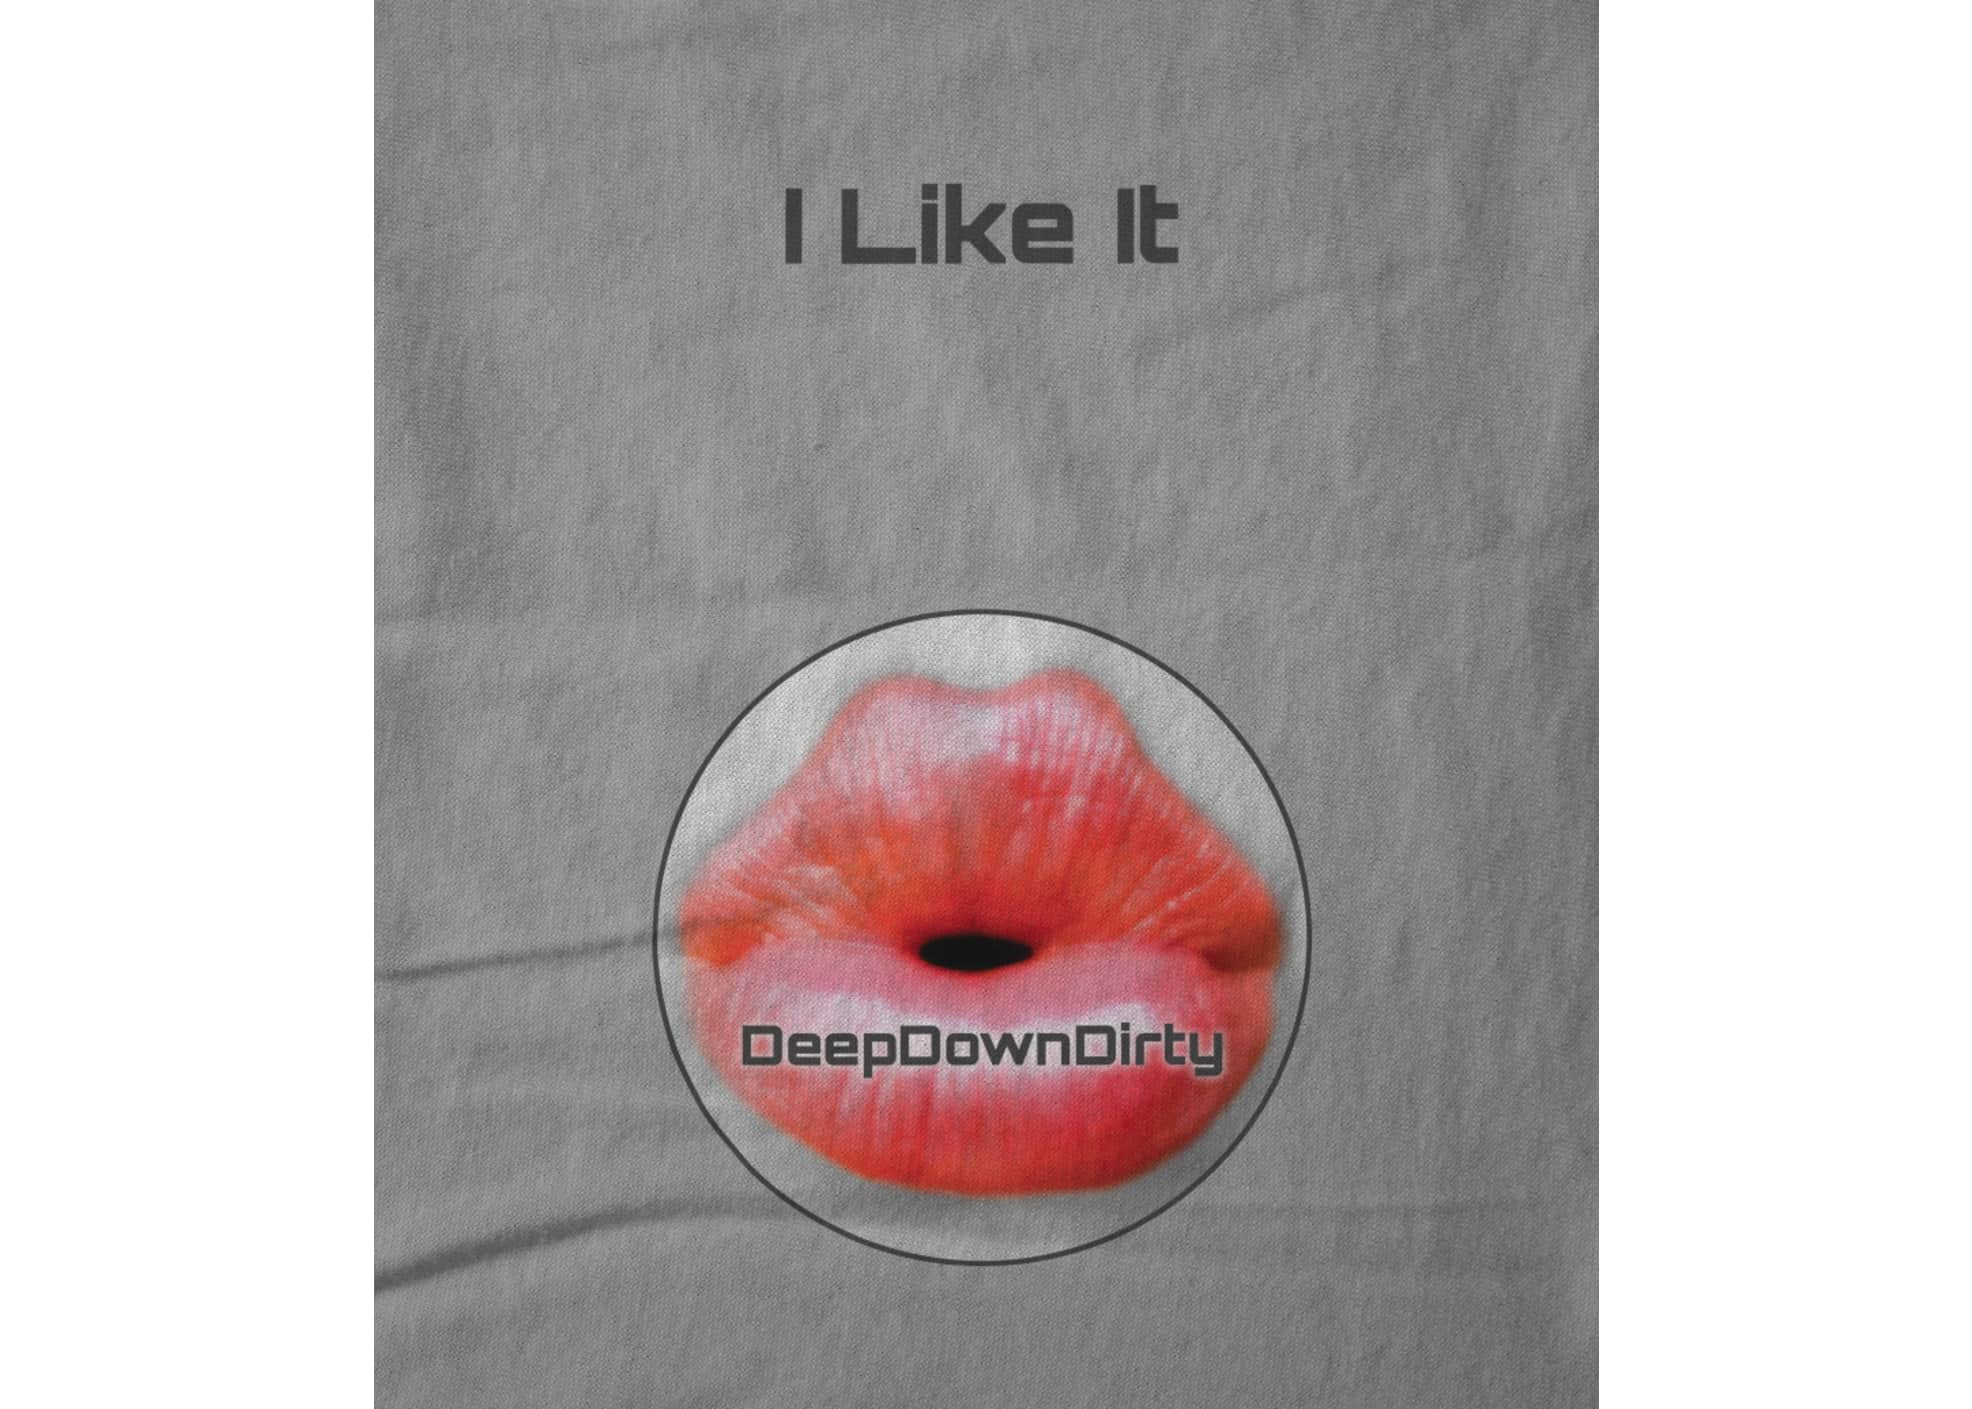 Deepdowndirty record label i like it circular s 1523347189